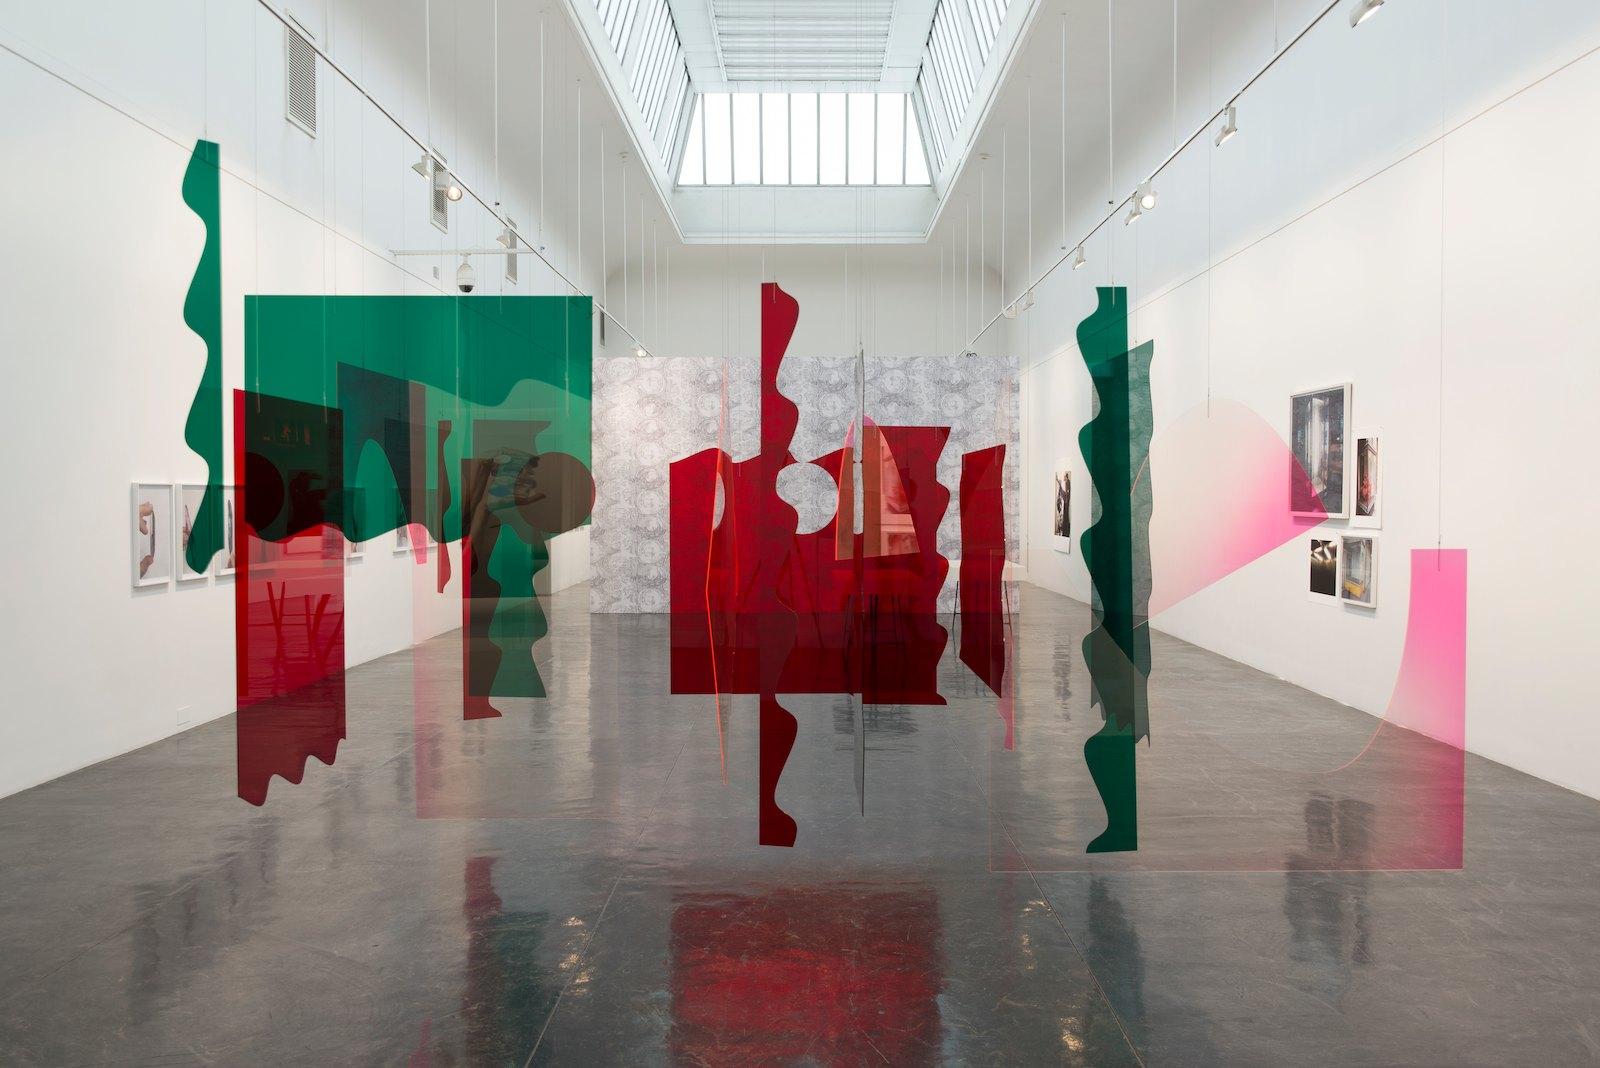 interview, 1968 / 2014, plexiglas, variable dimensions, image courtesy of Kunstnernes Hus, photo: Christina Leithe Hansen